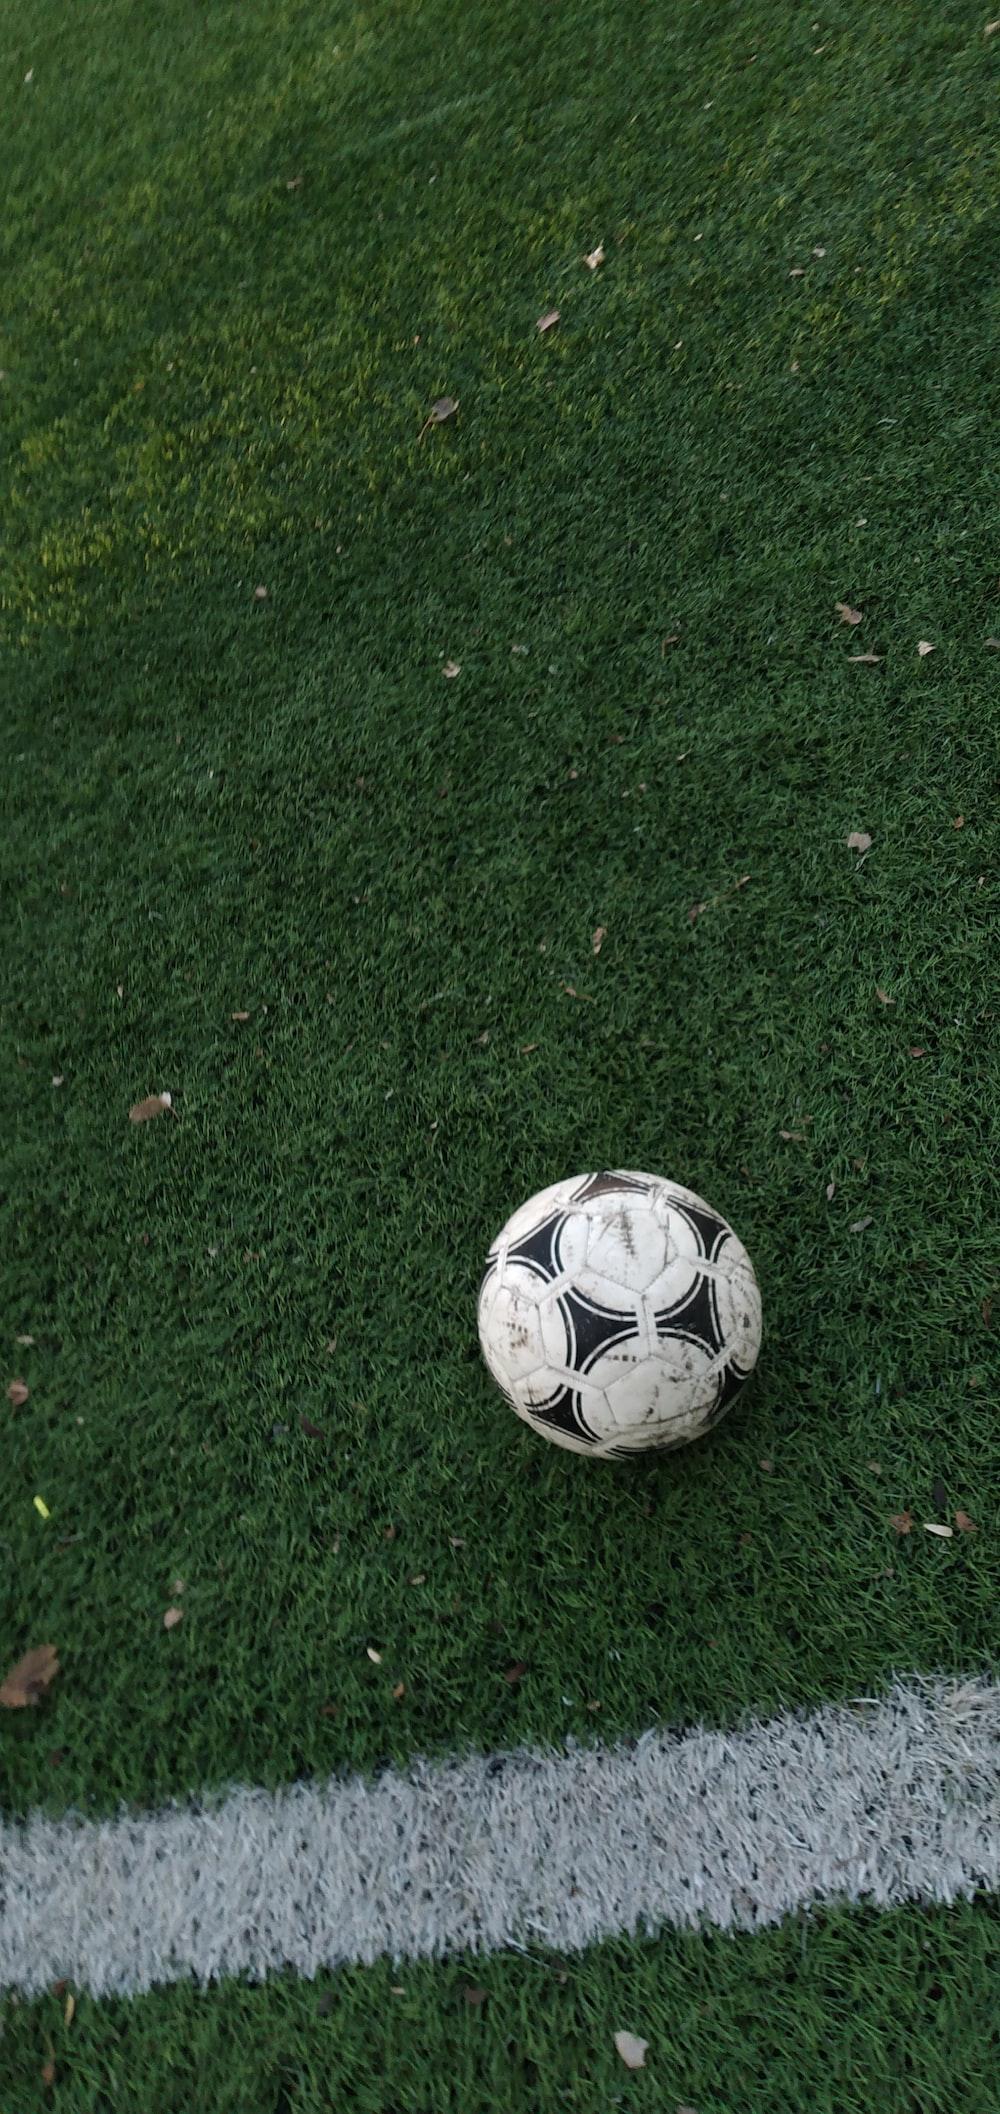 white and black soccer ball on grass